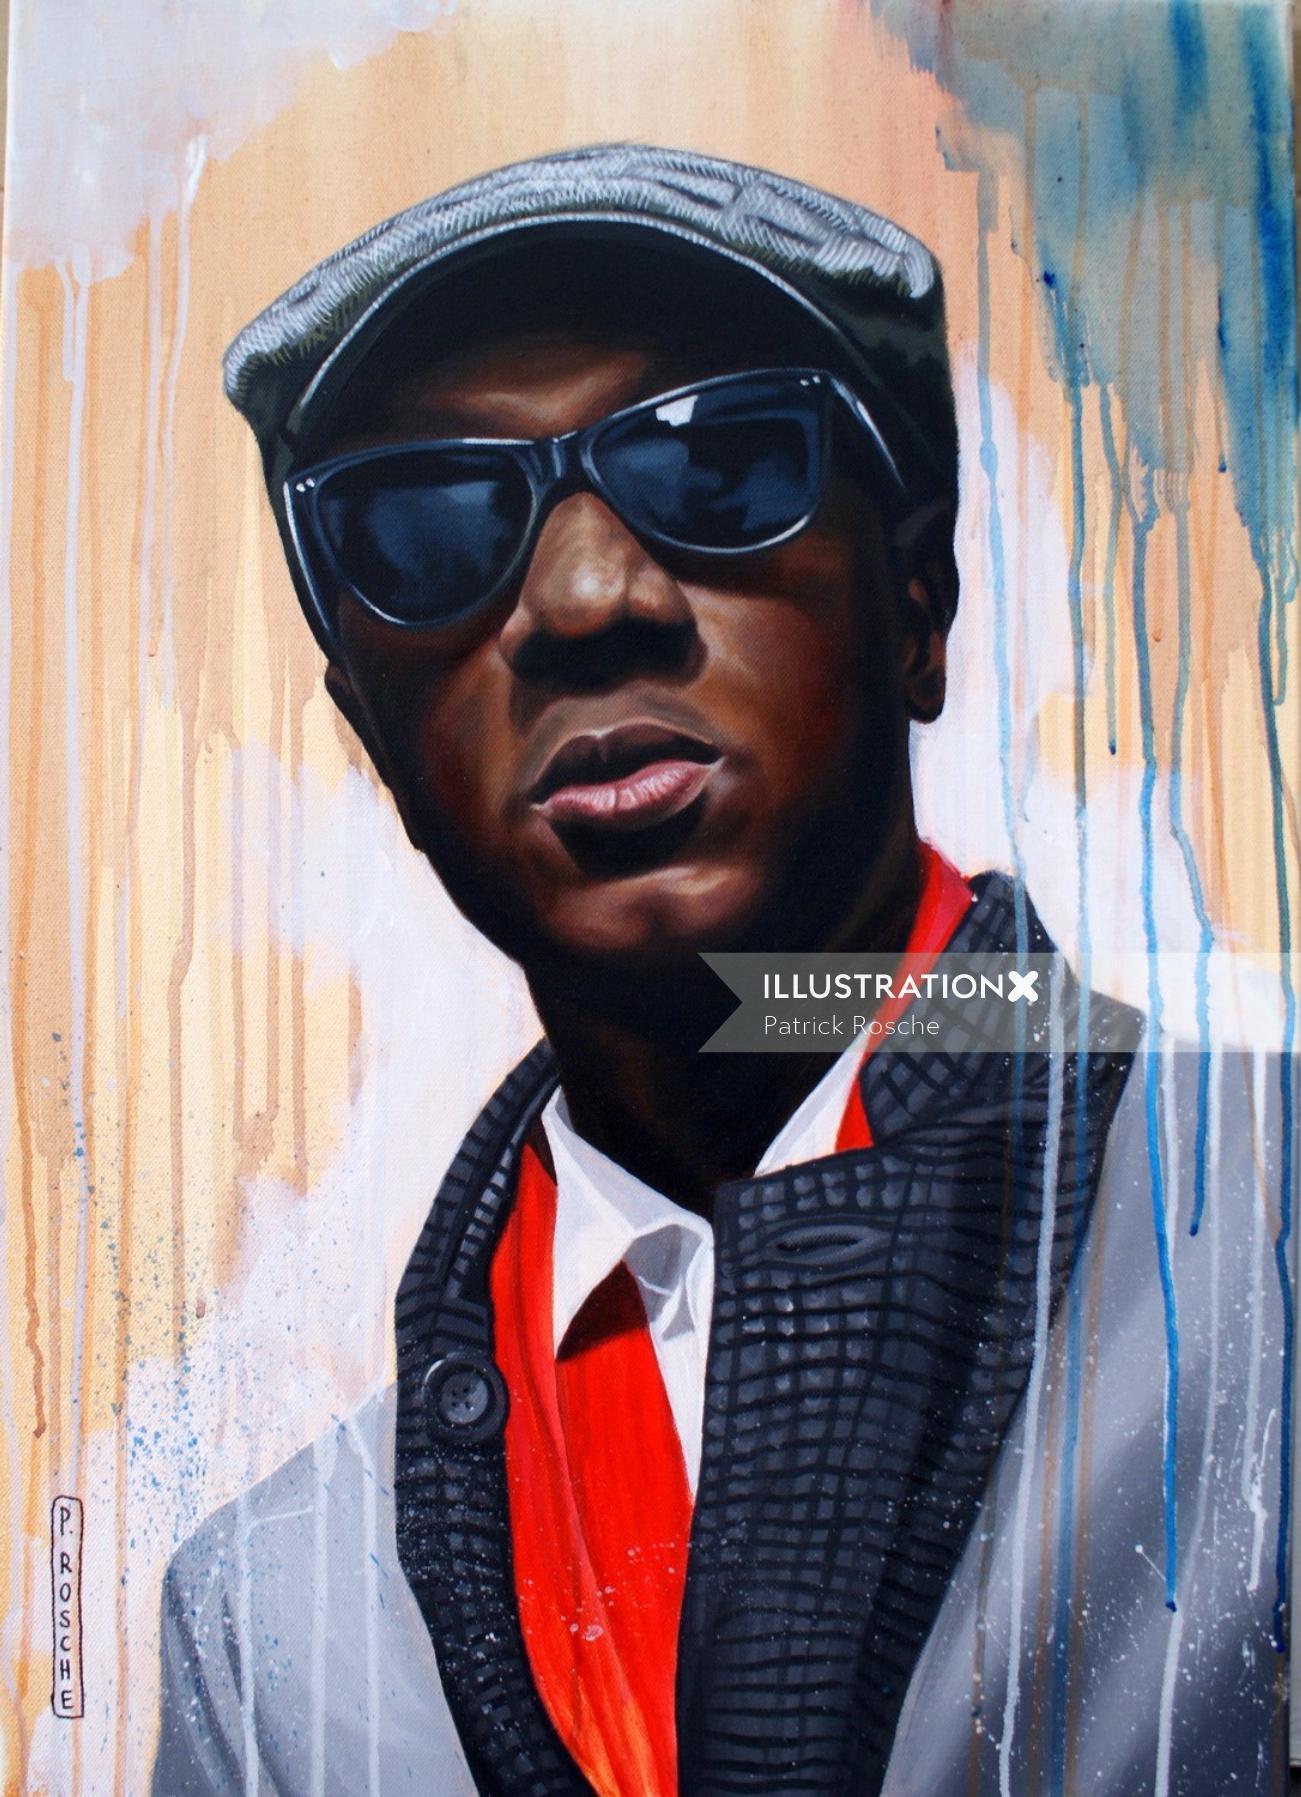 portrait illustration of Aloe Blacc